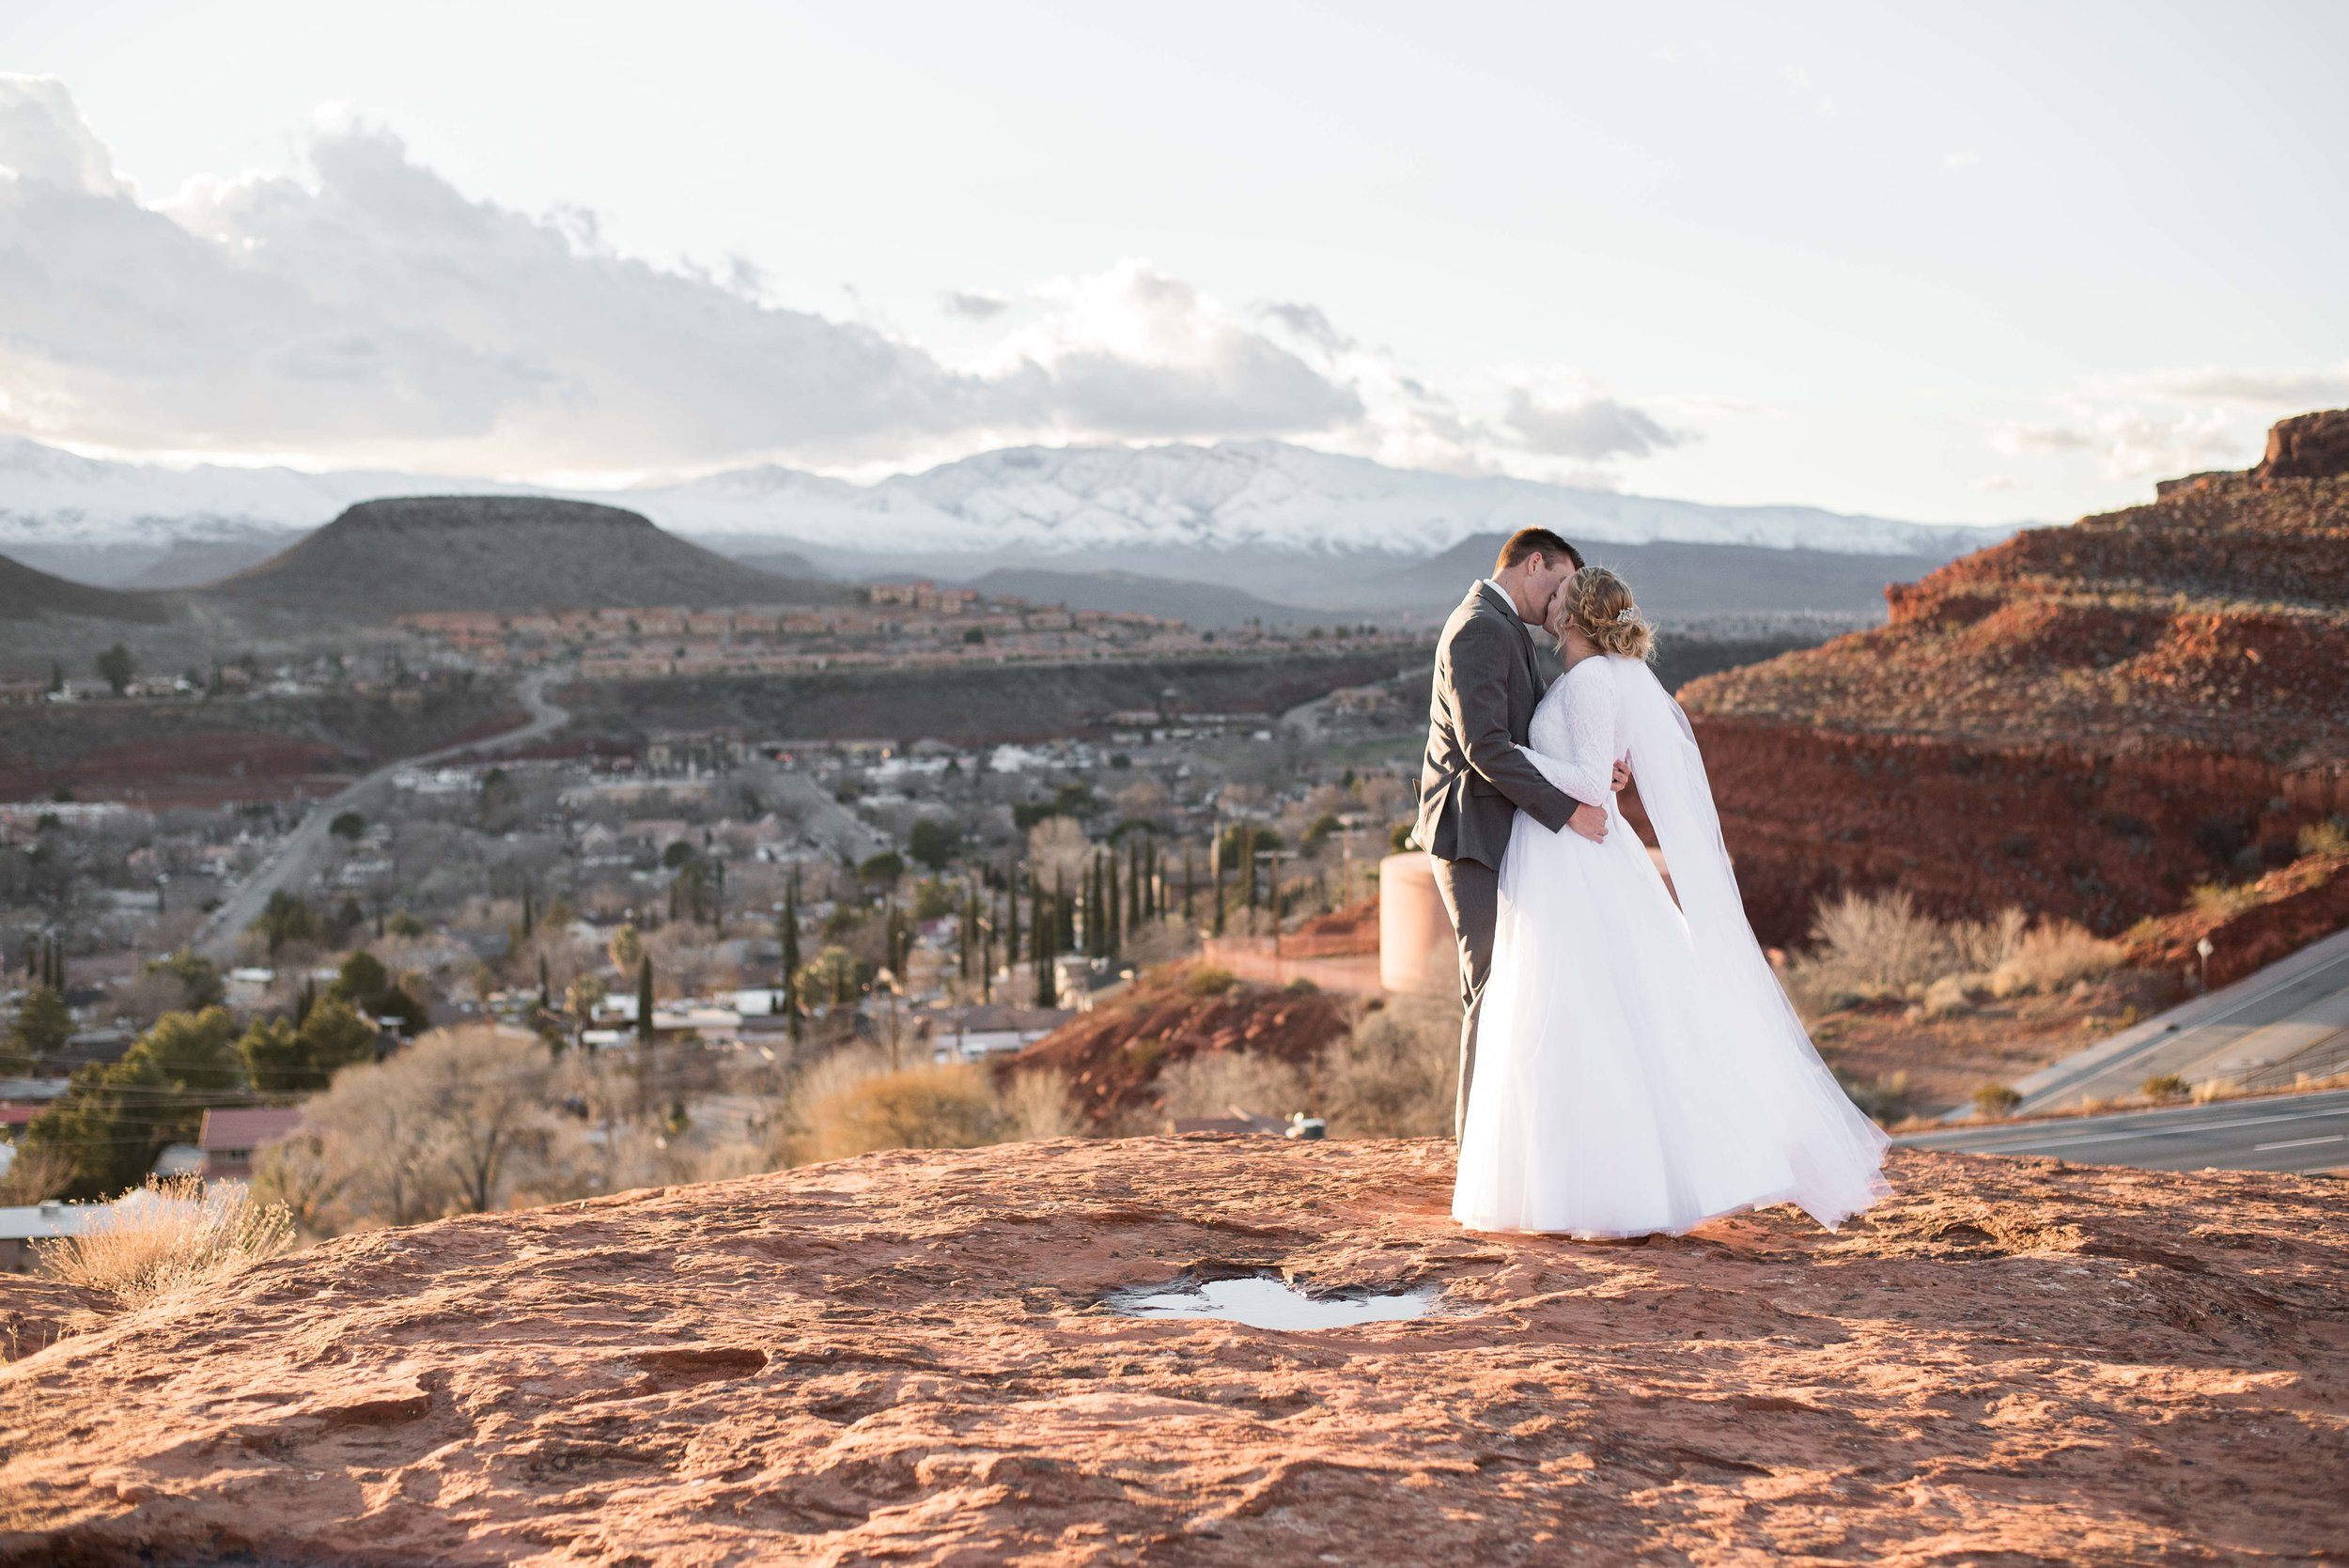 Braxton+Kaycee-BRIDALS-Sadie-Banks-Photography-206.jpg